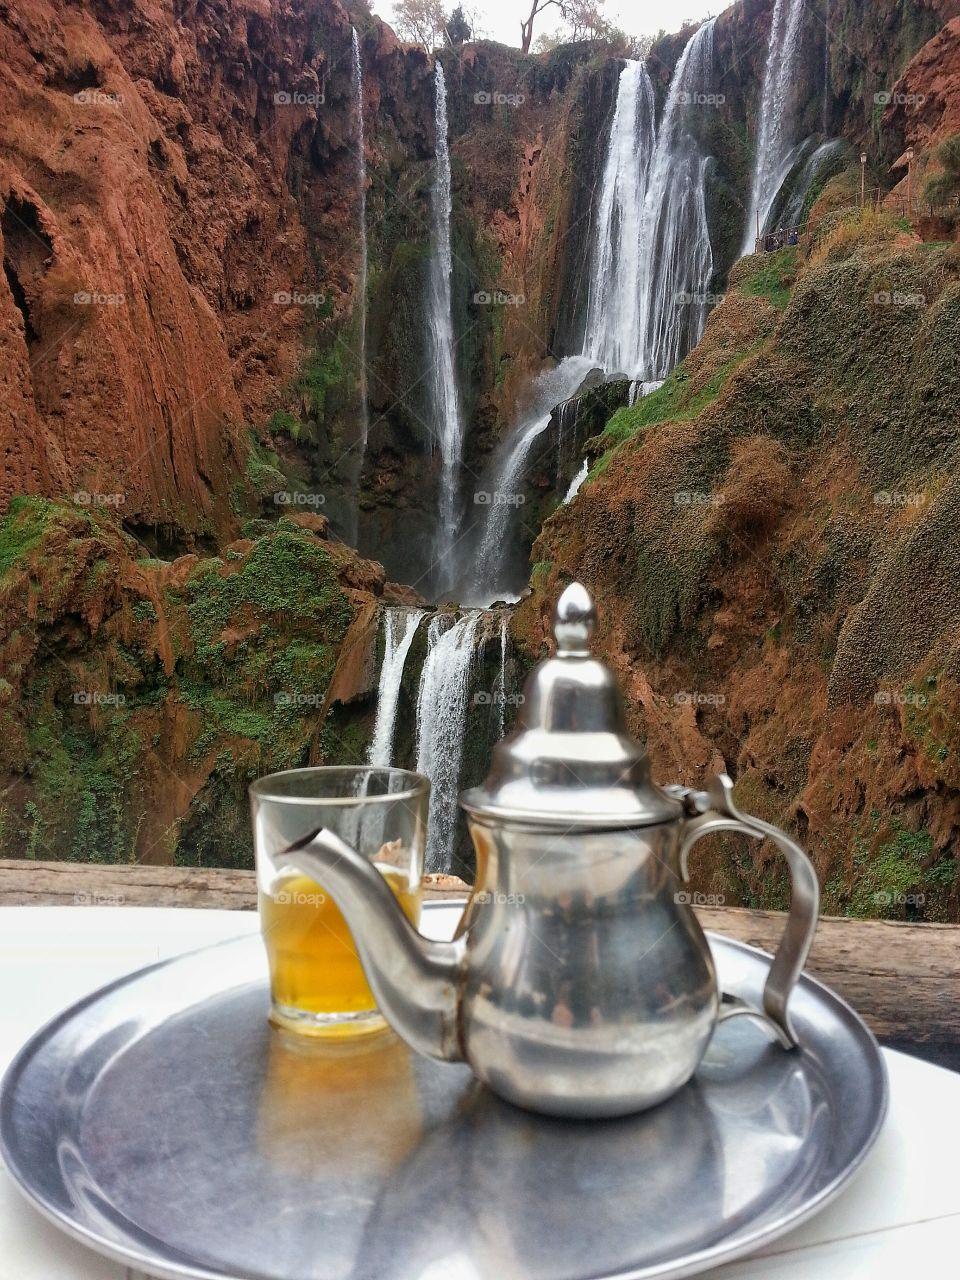 Tea time Moroccan style